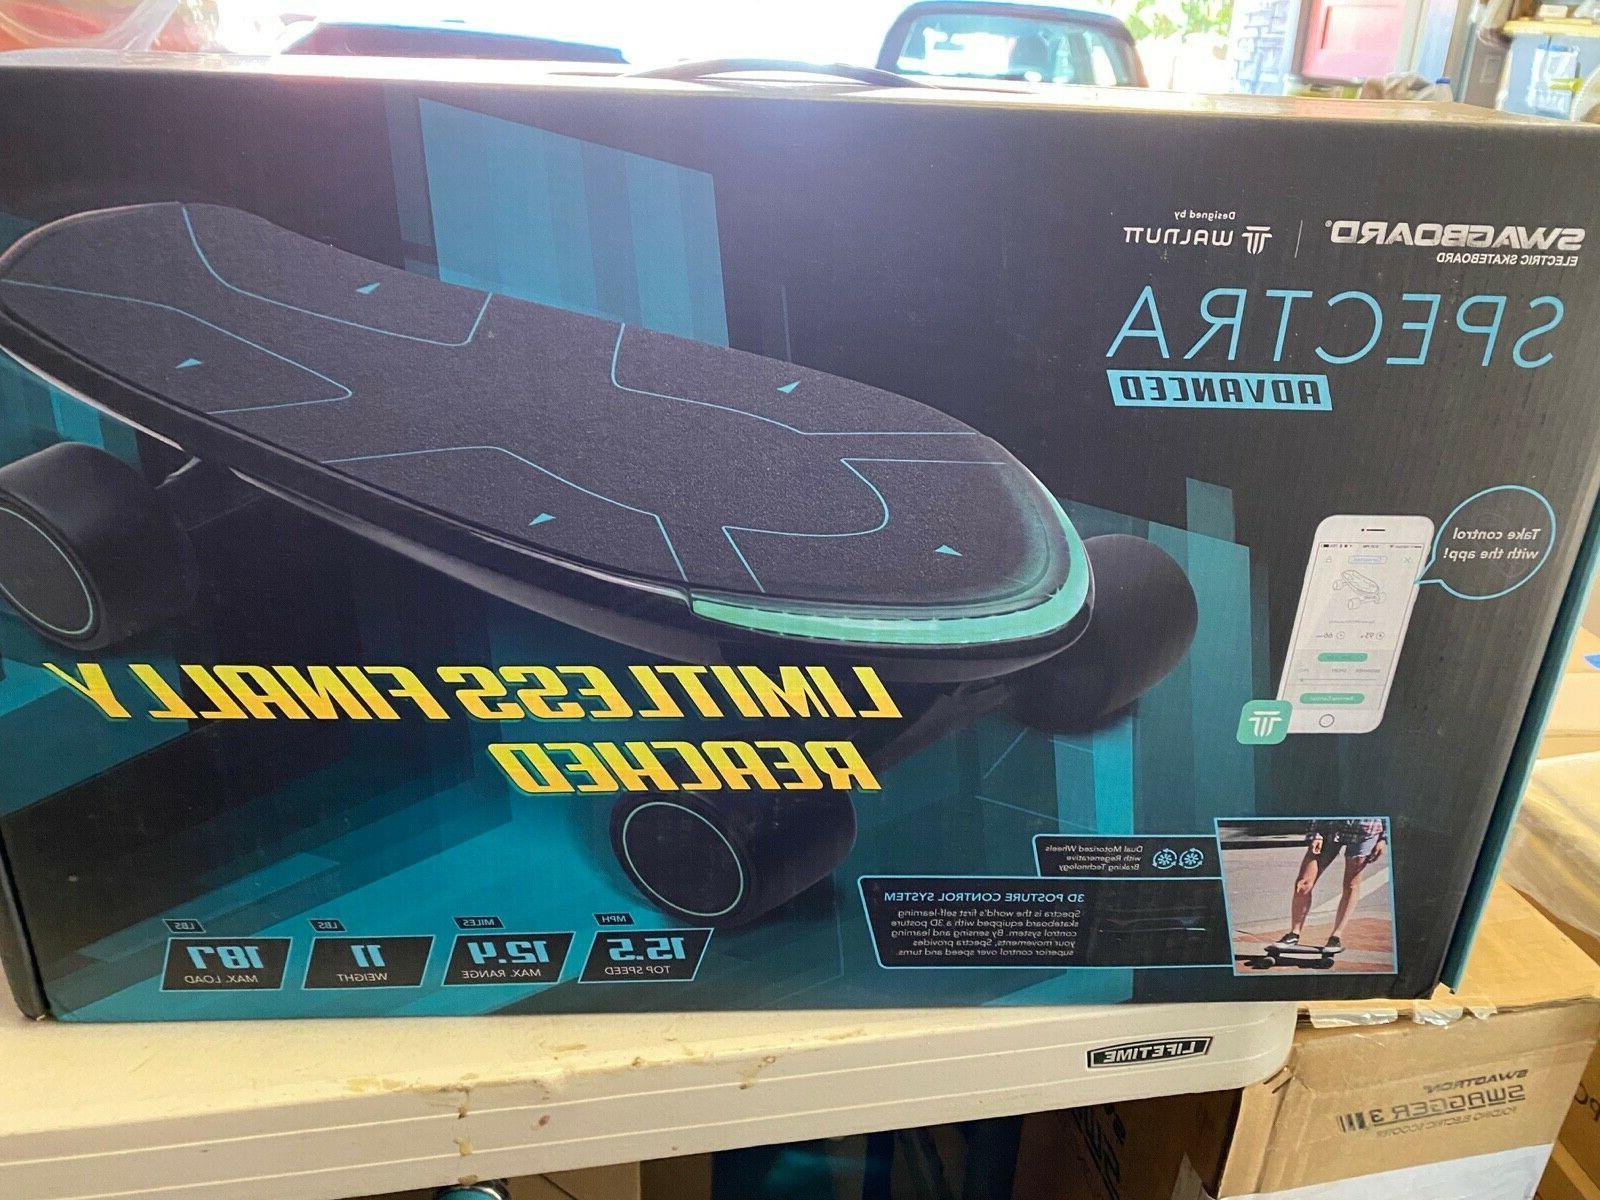 spectra advanced electric skateboard 15 5mph 12